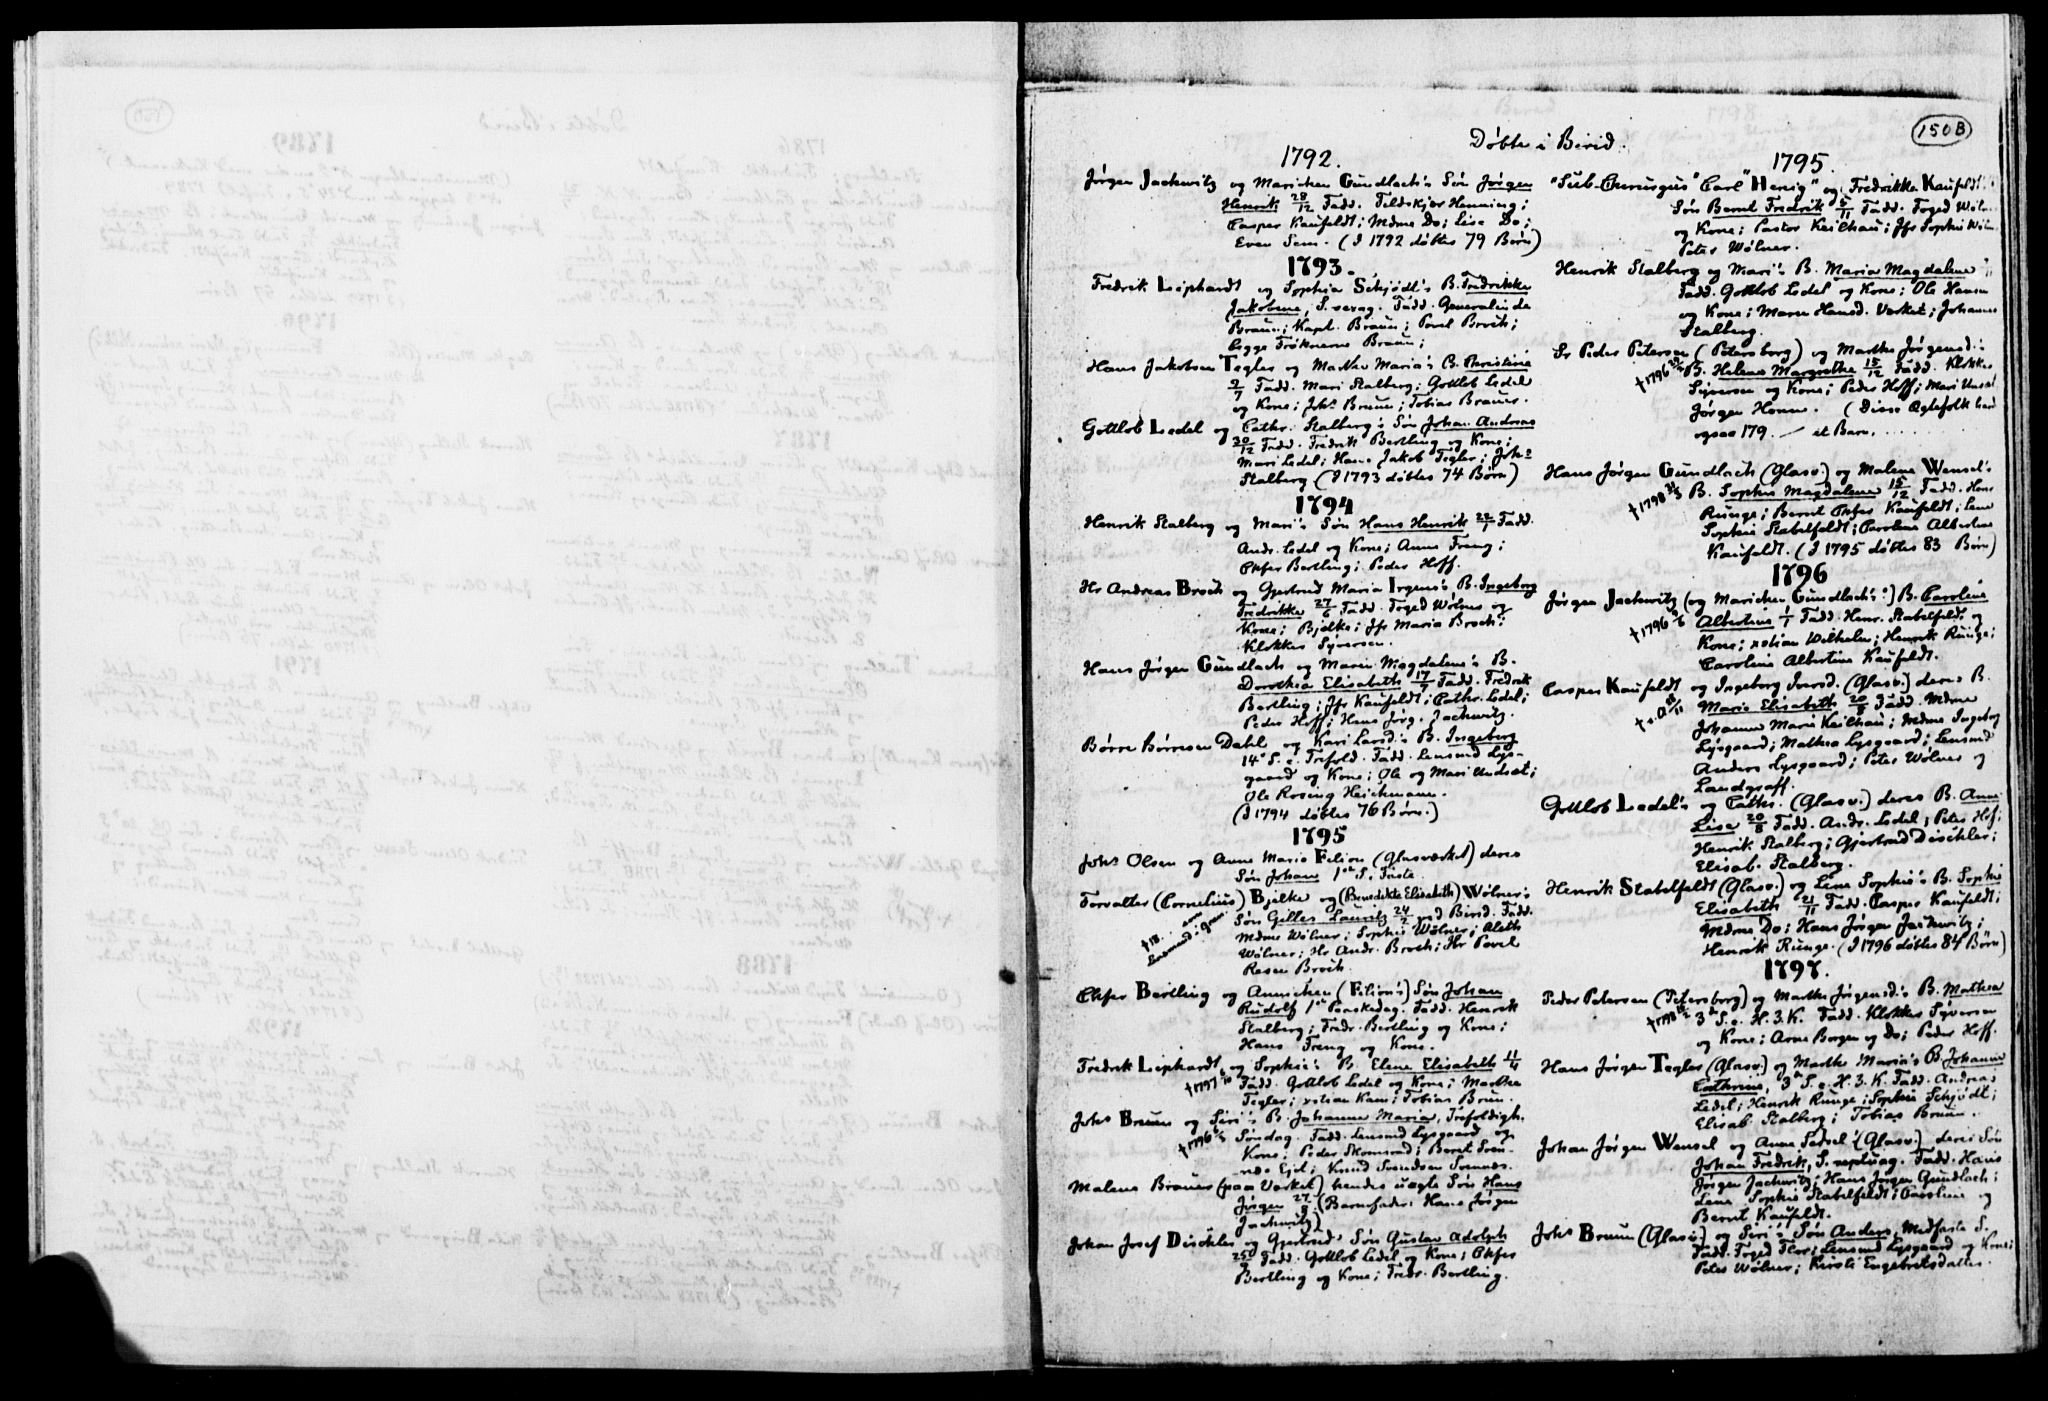 SAH, Biri prestekontor, Ministerialbok, 1730-1879, s. 150b